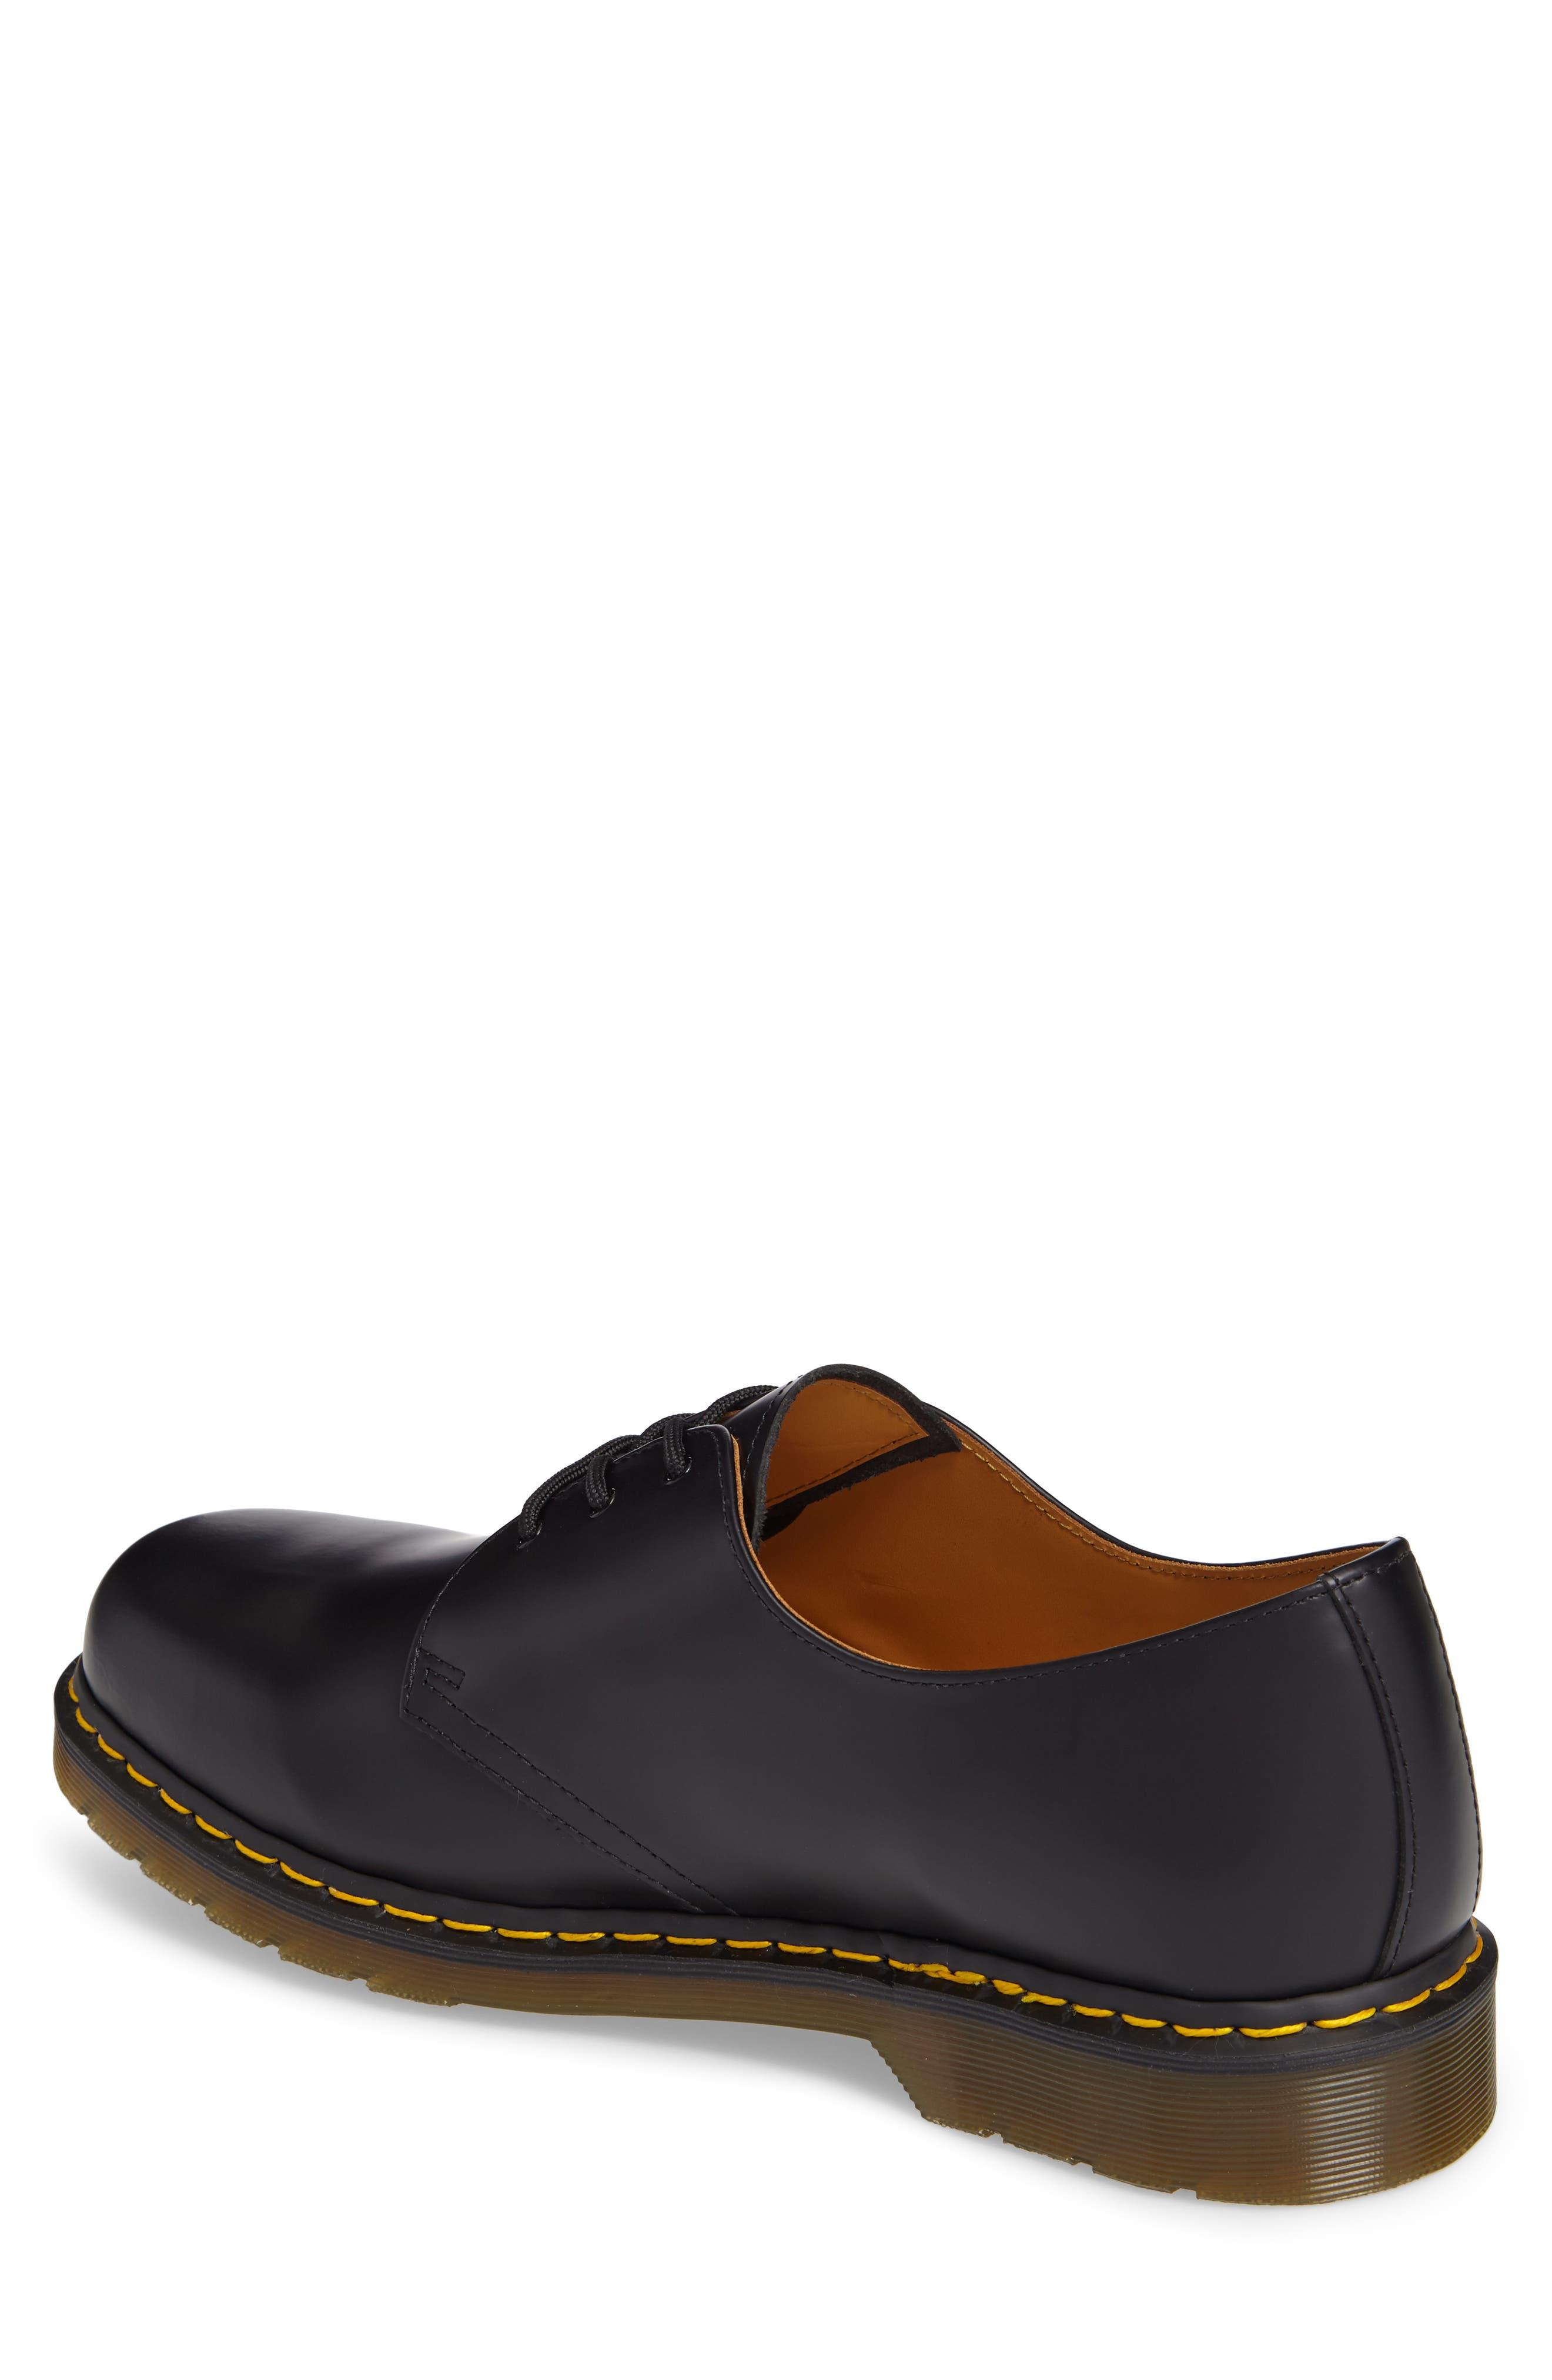 DR. MARTENS, Plain Toe Derby, Alternate thumbnail 2, color, BLACK SMOOTH